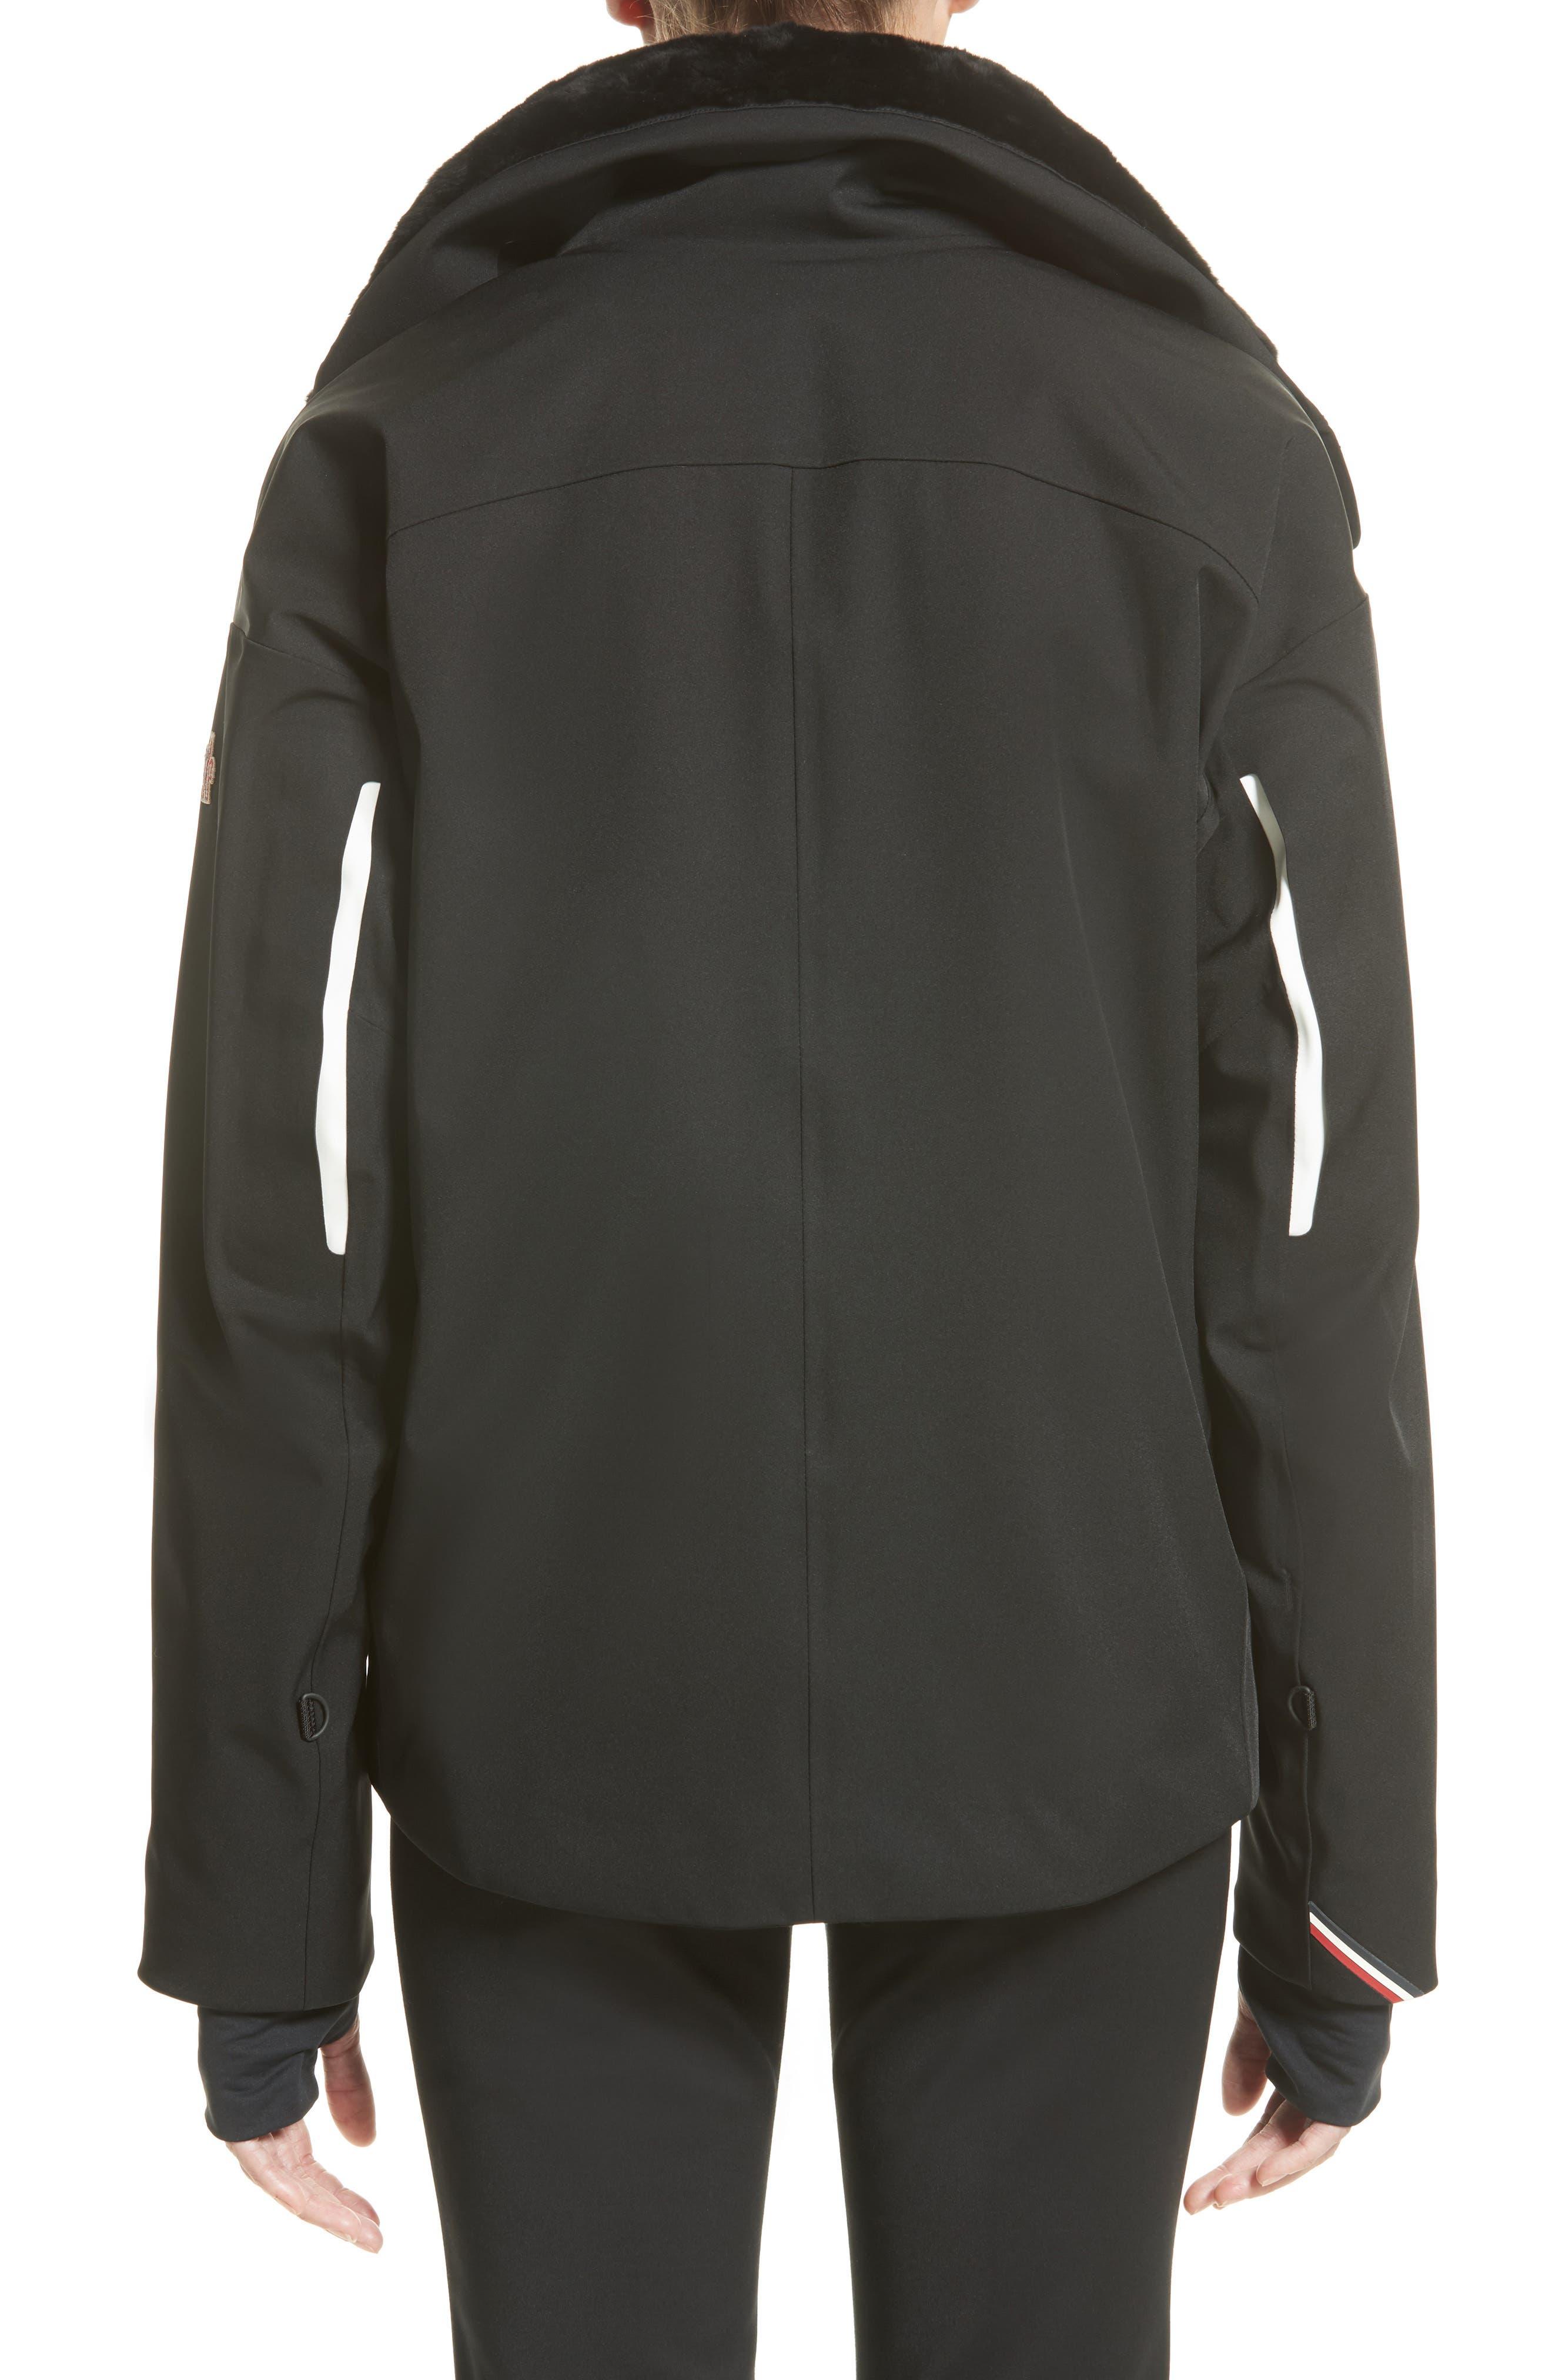 Troisvallees Jacket with Genuine Nutria Fur Collar,                             Alternate thumbnail 2, color,                             Black/ White